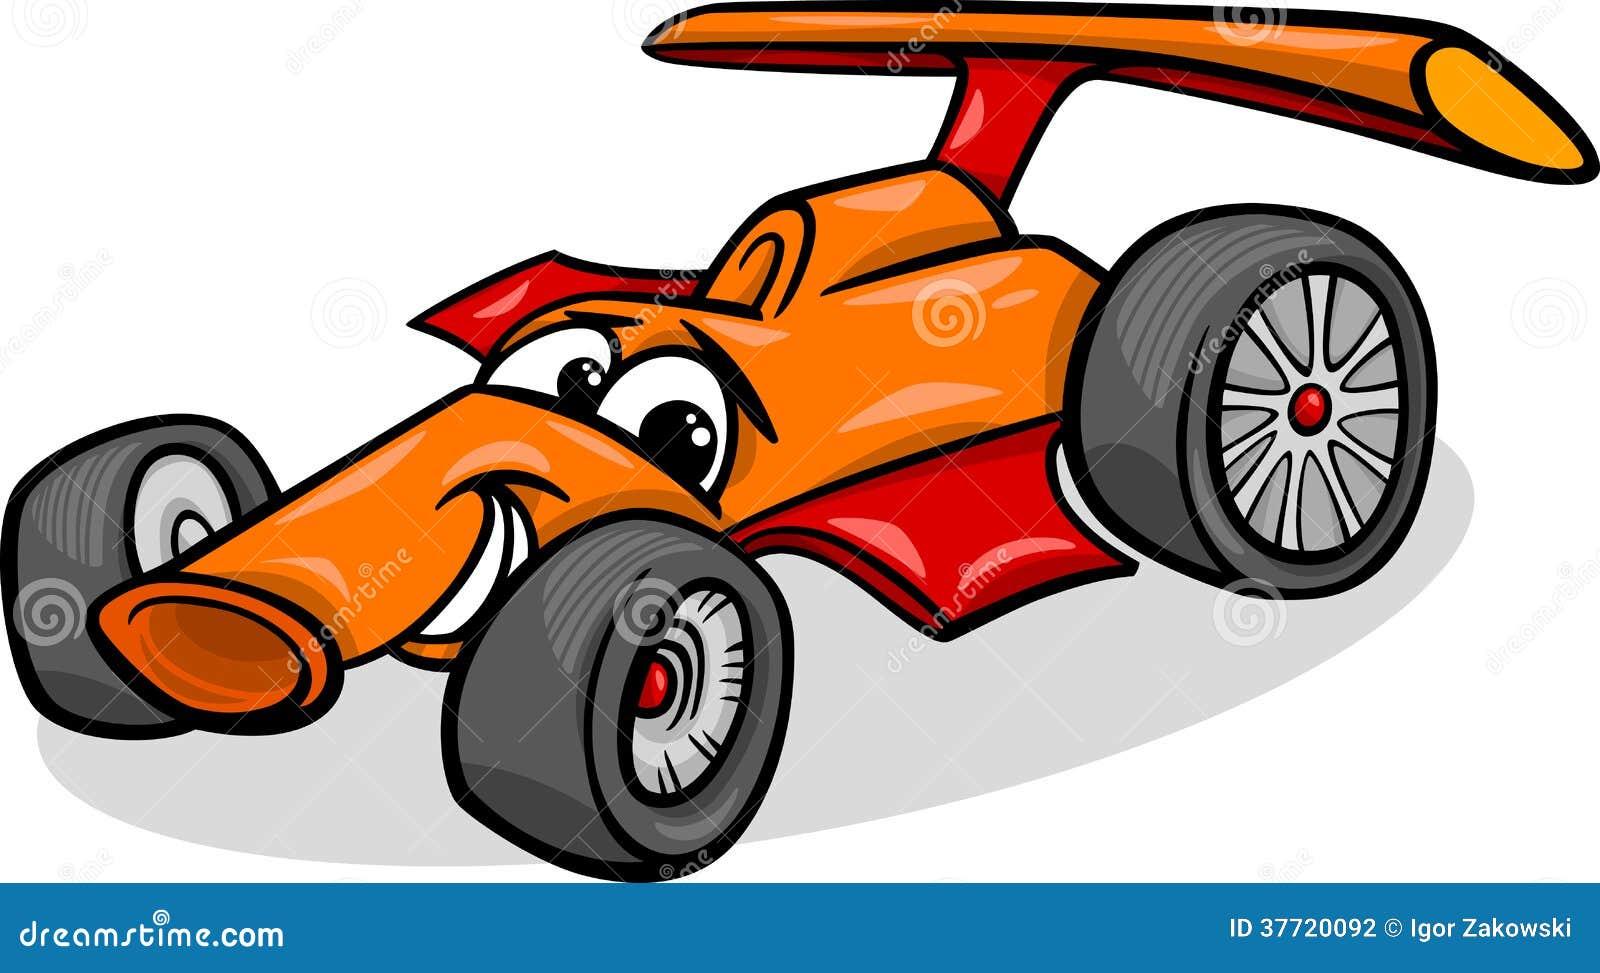 racing car bolide cartoon illustration stock vector. Black Bedroom Furniture Sets. Home Design Ideas